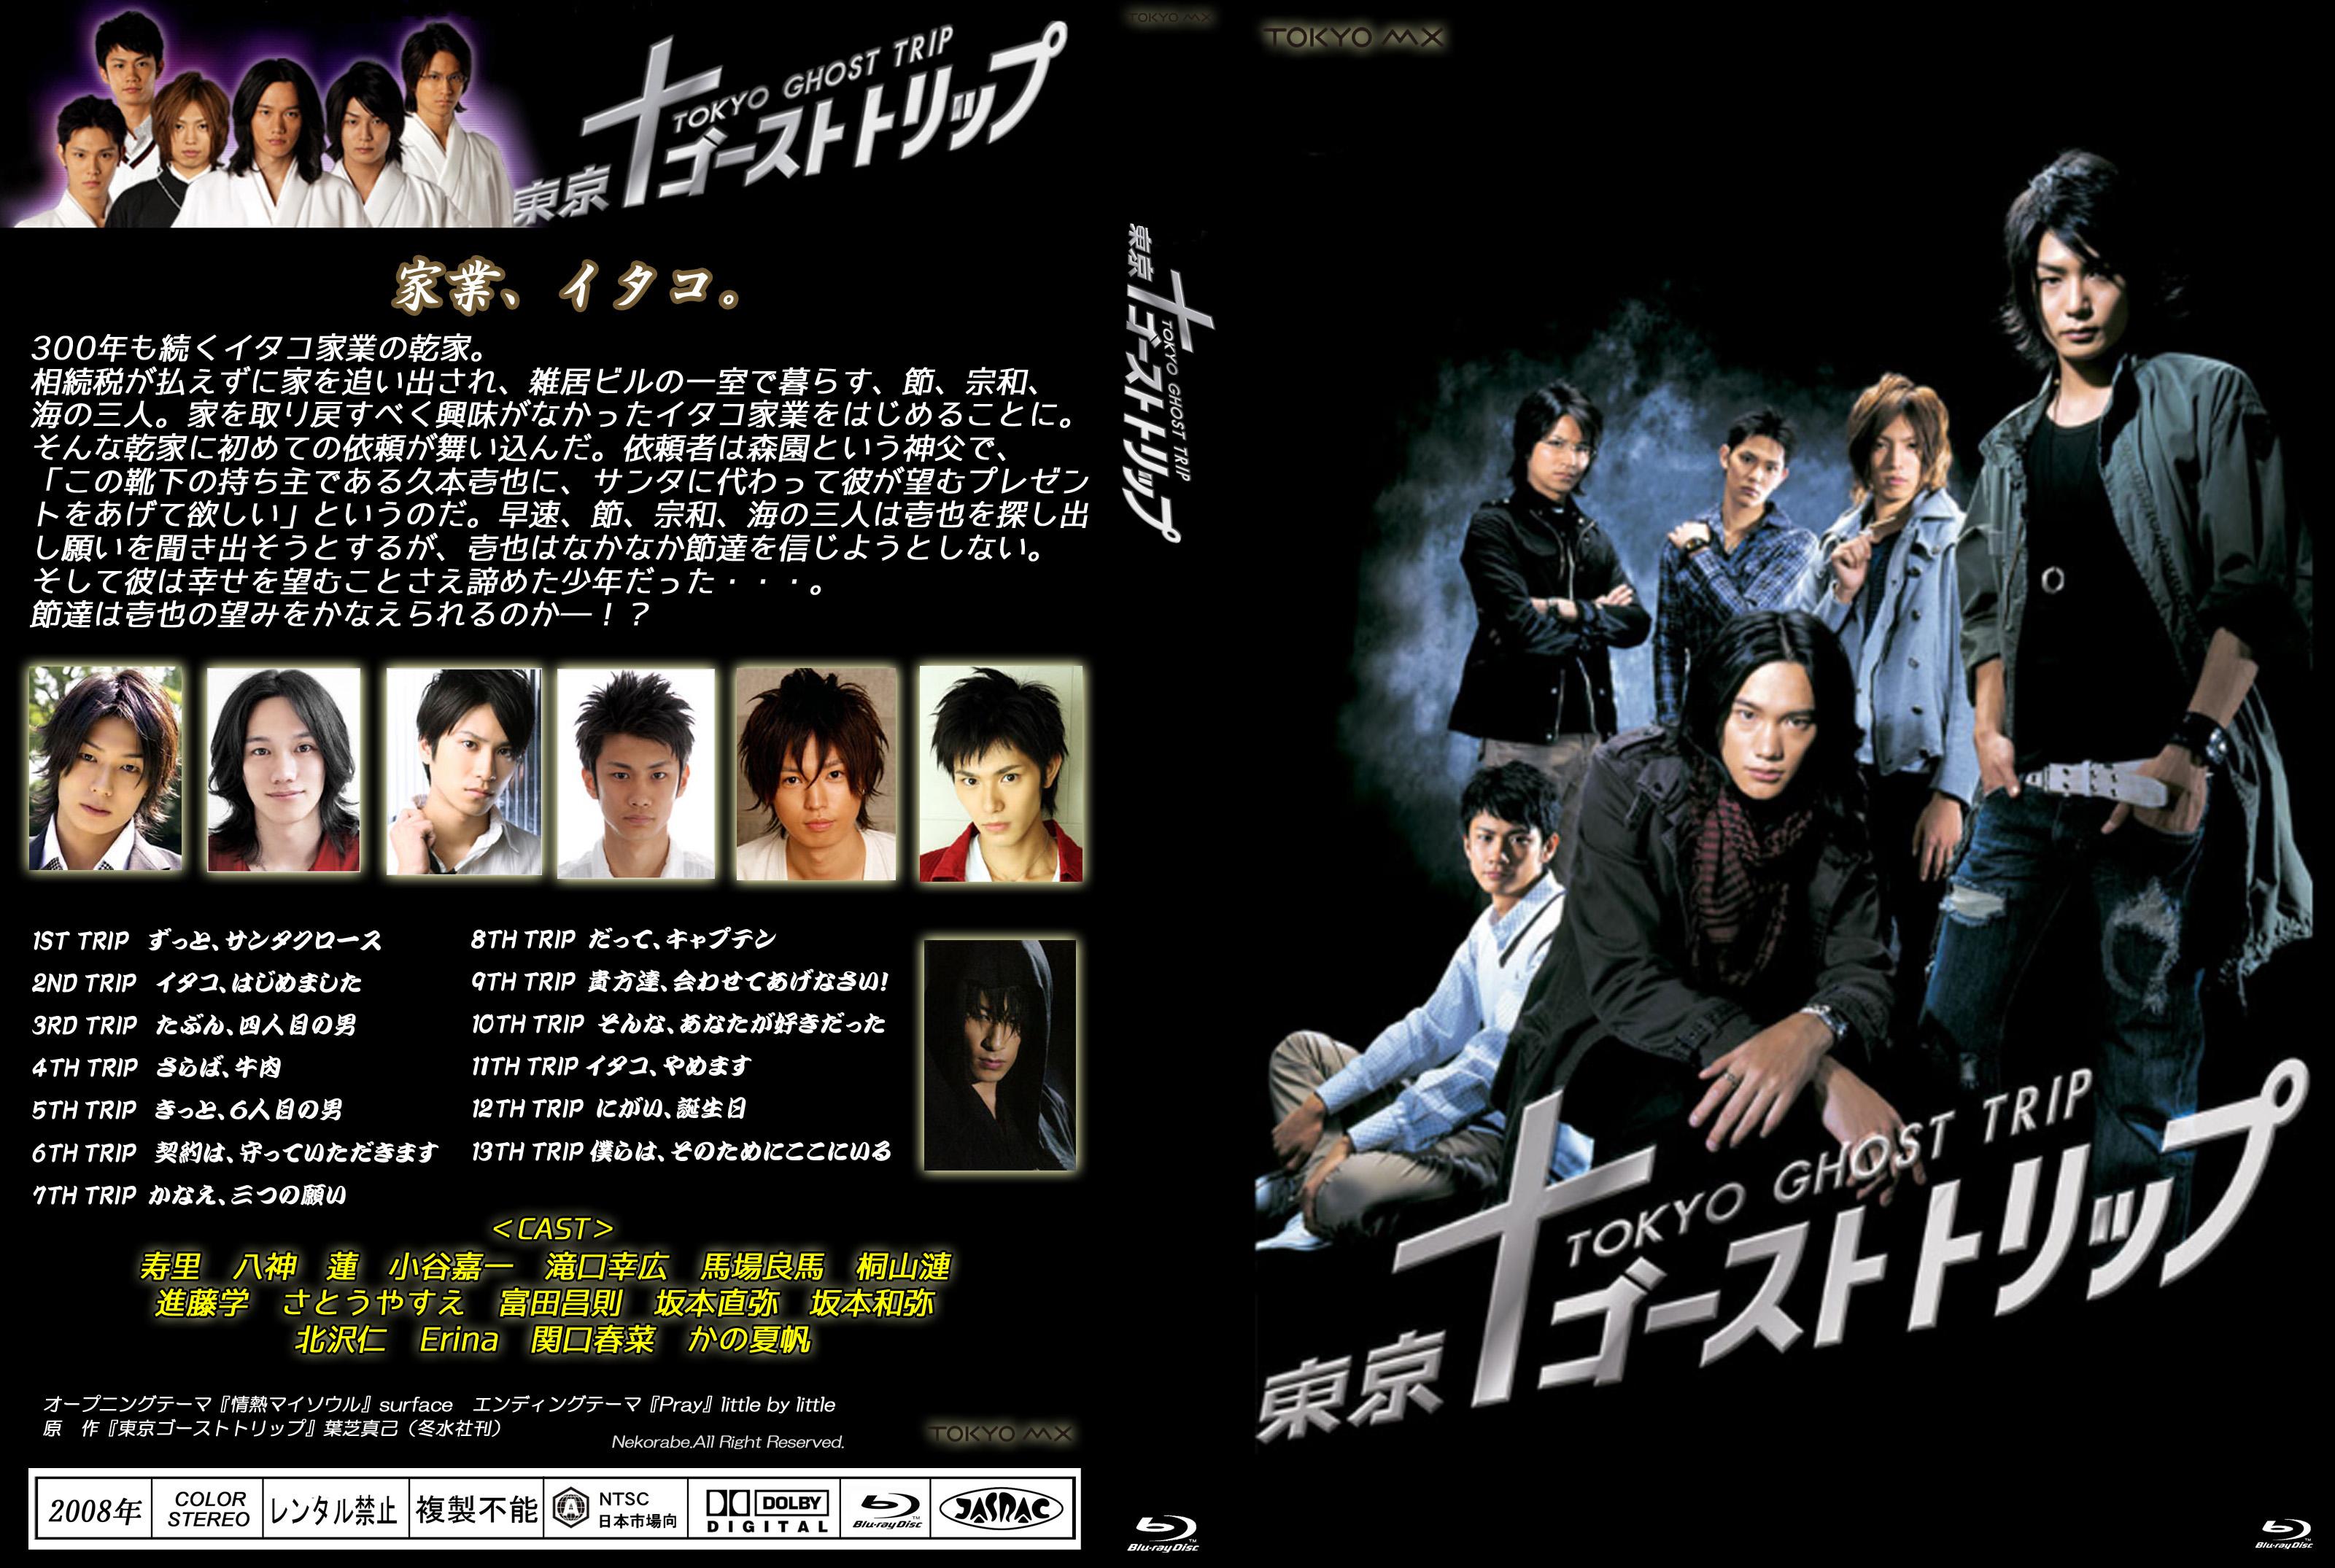 Yoshikazu Kotani, Juri, Yukihiro Takiguchi, Ren Kiriyama, Len Yagami, and Ryôma Baba in Tôkyô gôsuto torippu (2008)